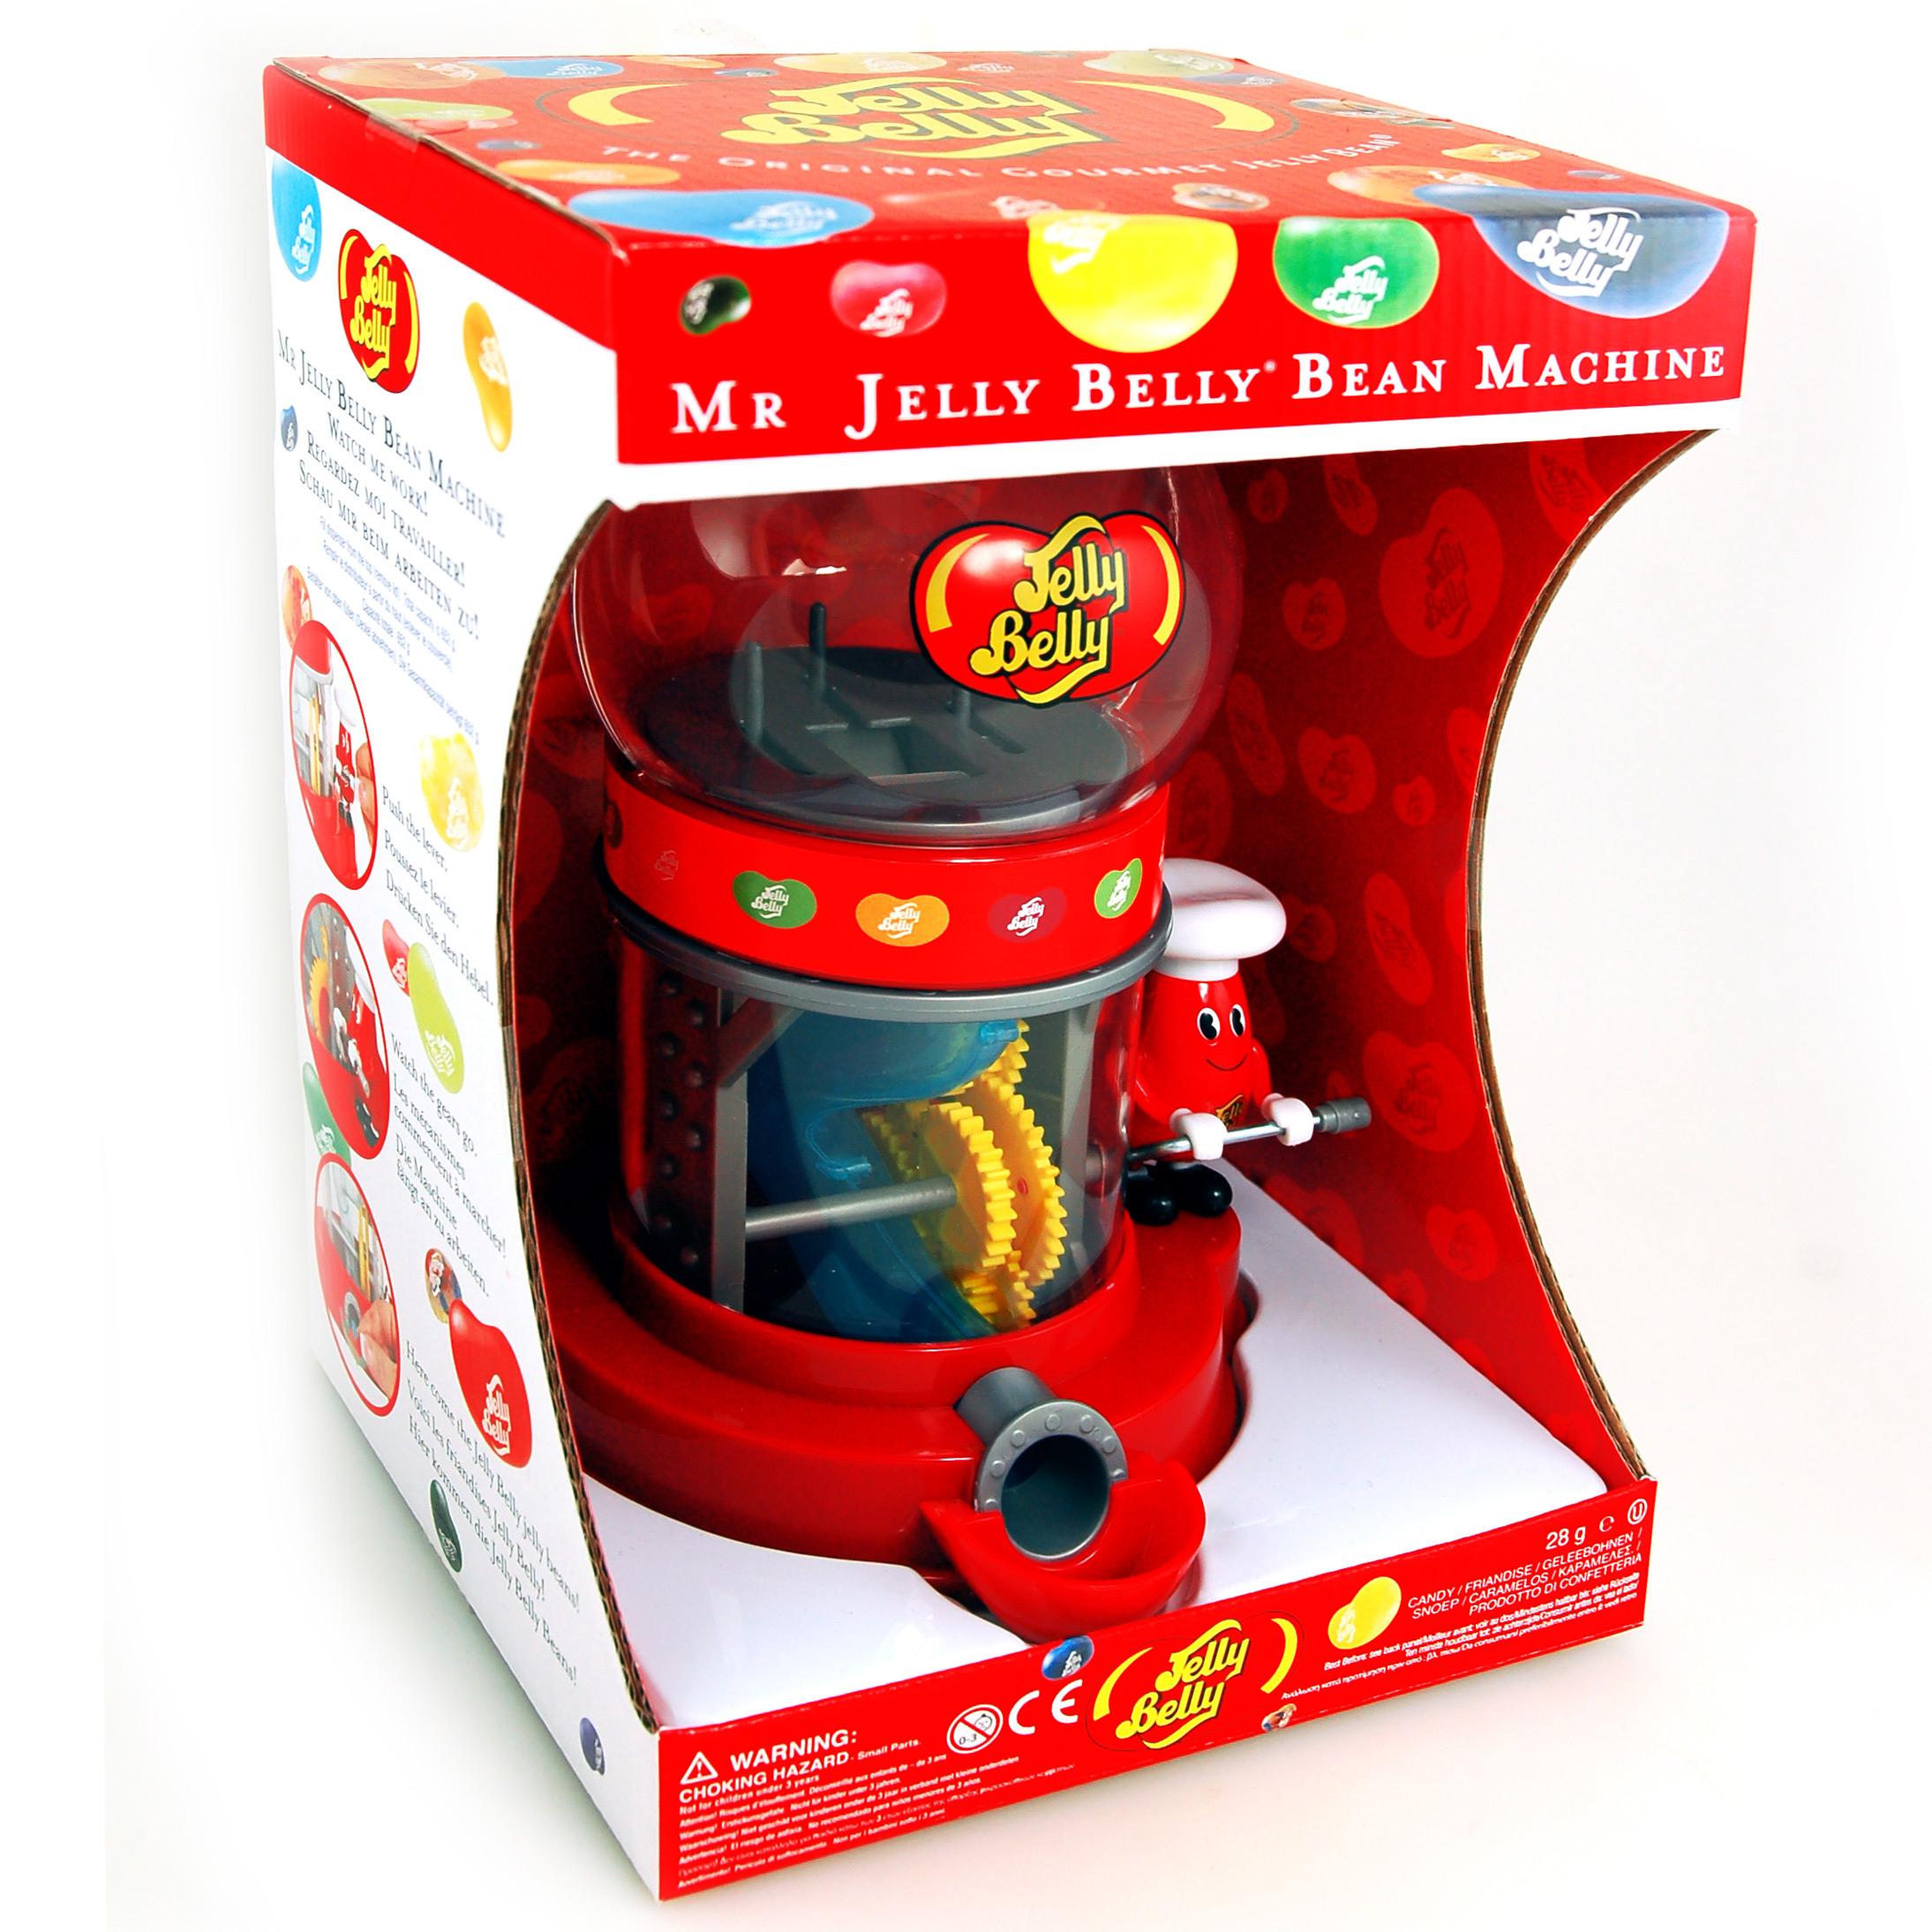 jelly belly mr jelly belly bean machine online kaufen. Black Bedroom Furniture Sets. Home Design Ideas